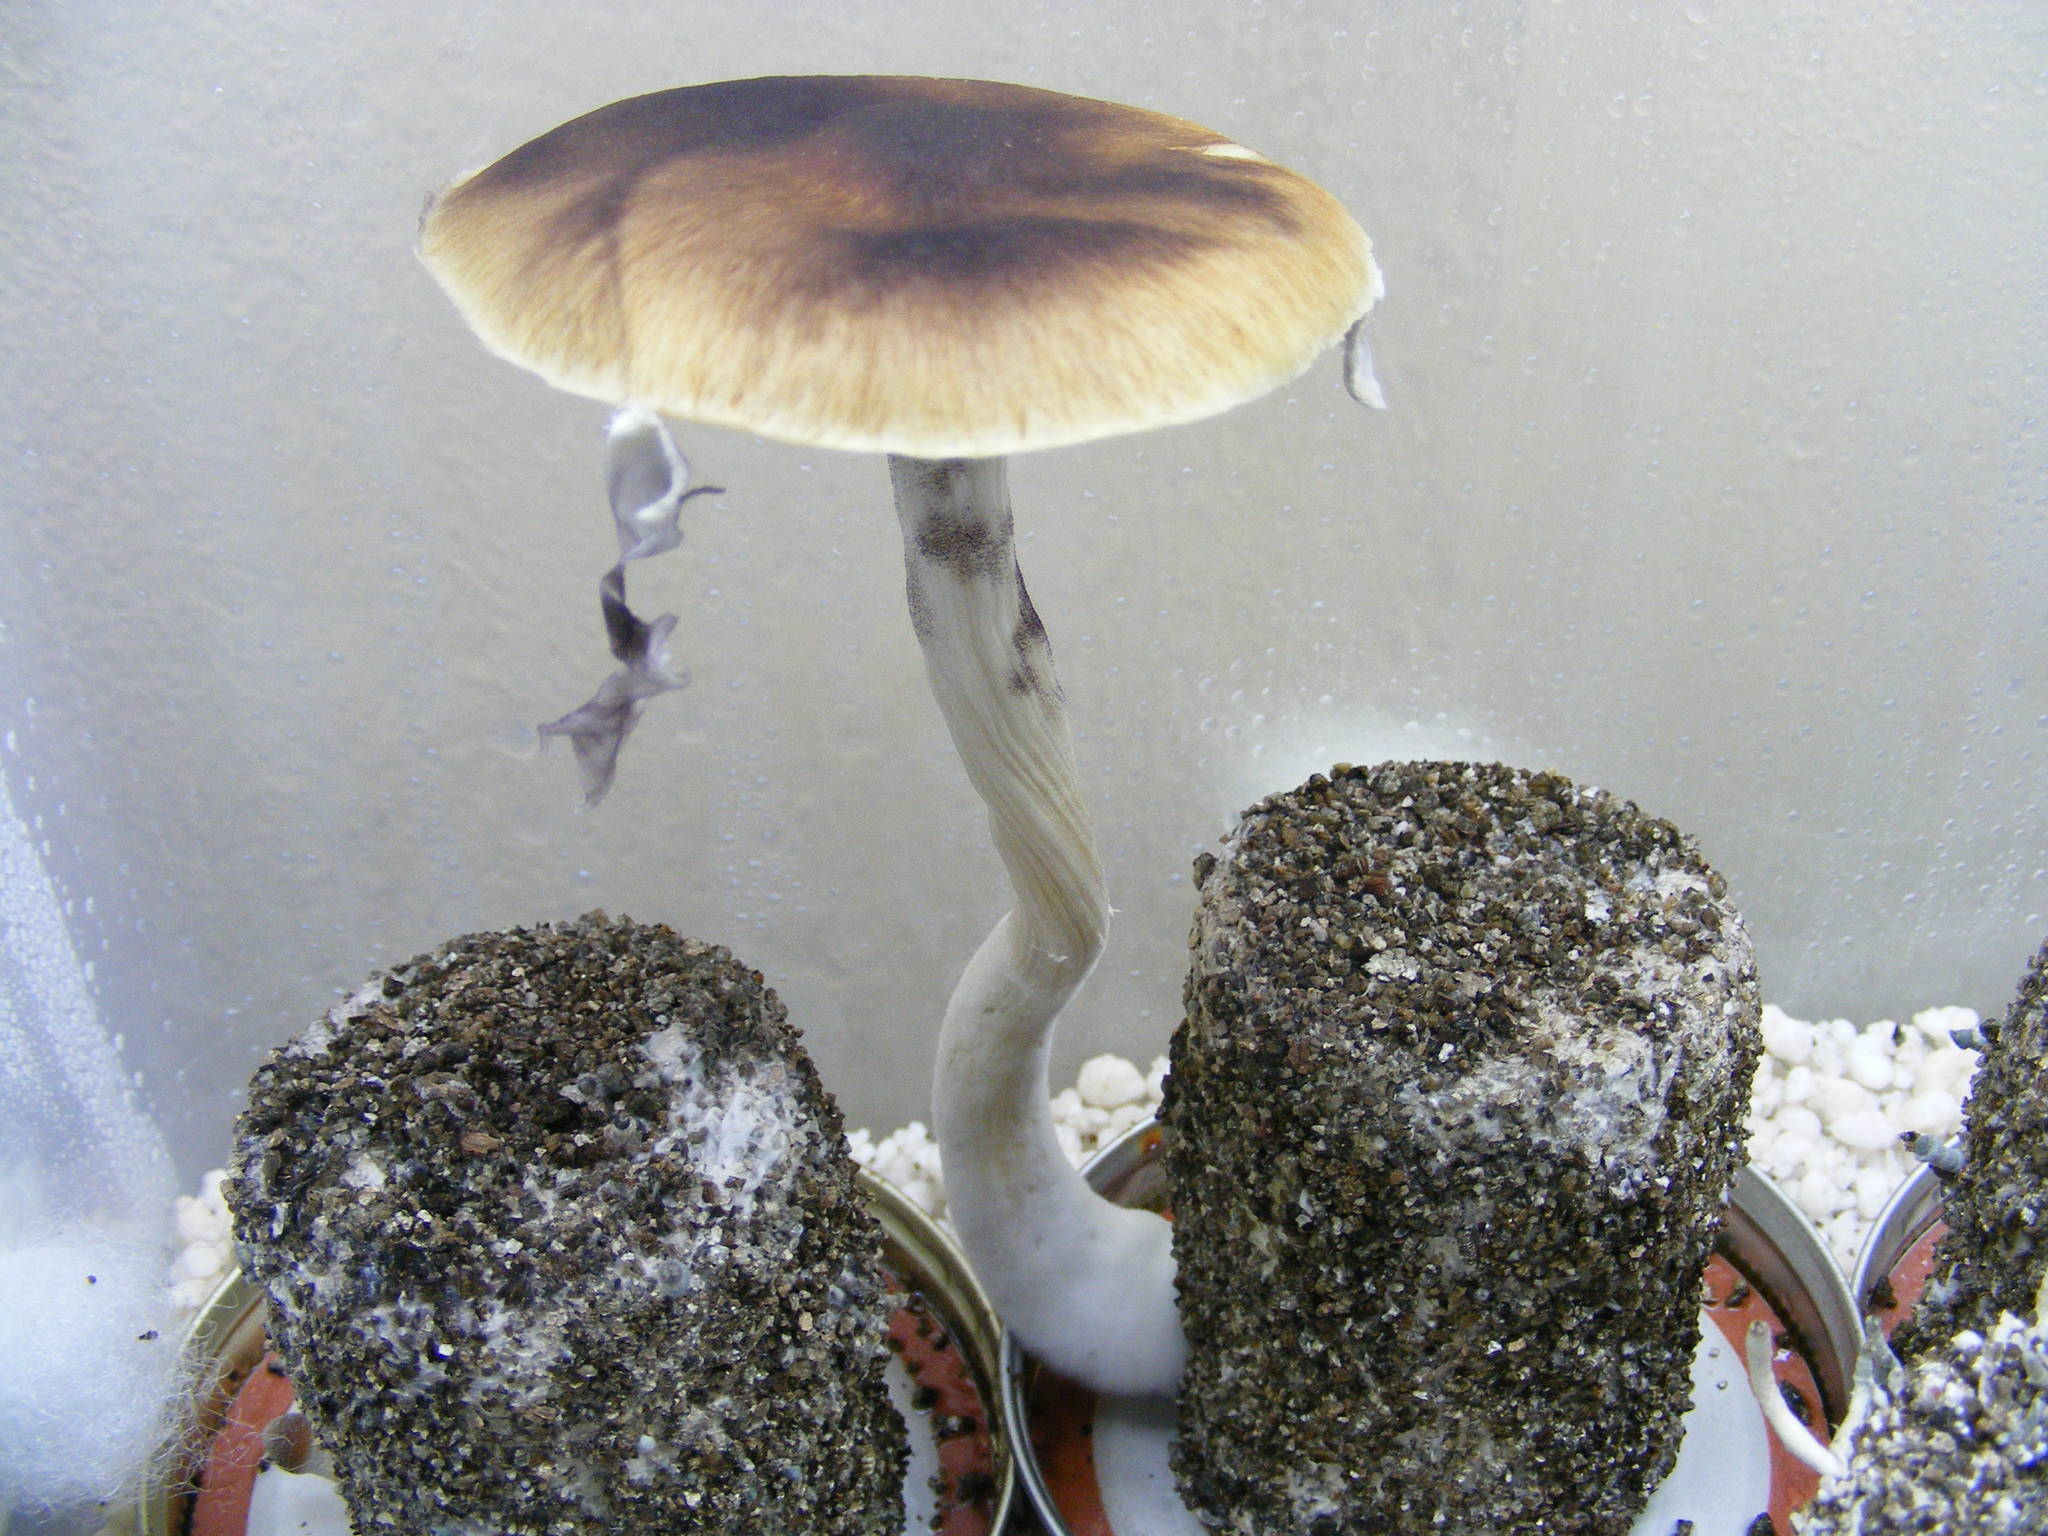 my first grow report with oak ridge(pics) - Mushroom Cultivation